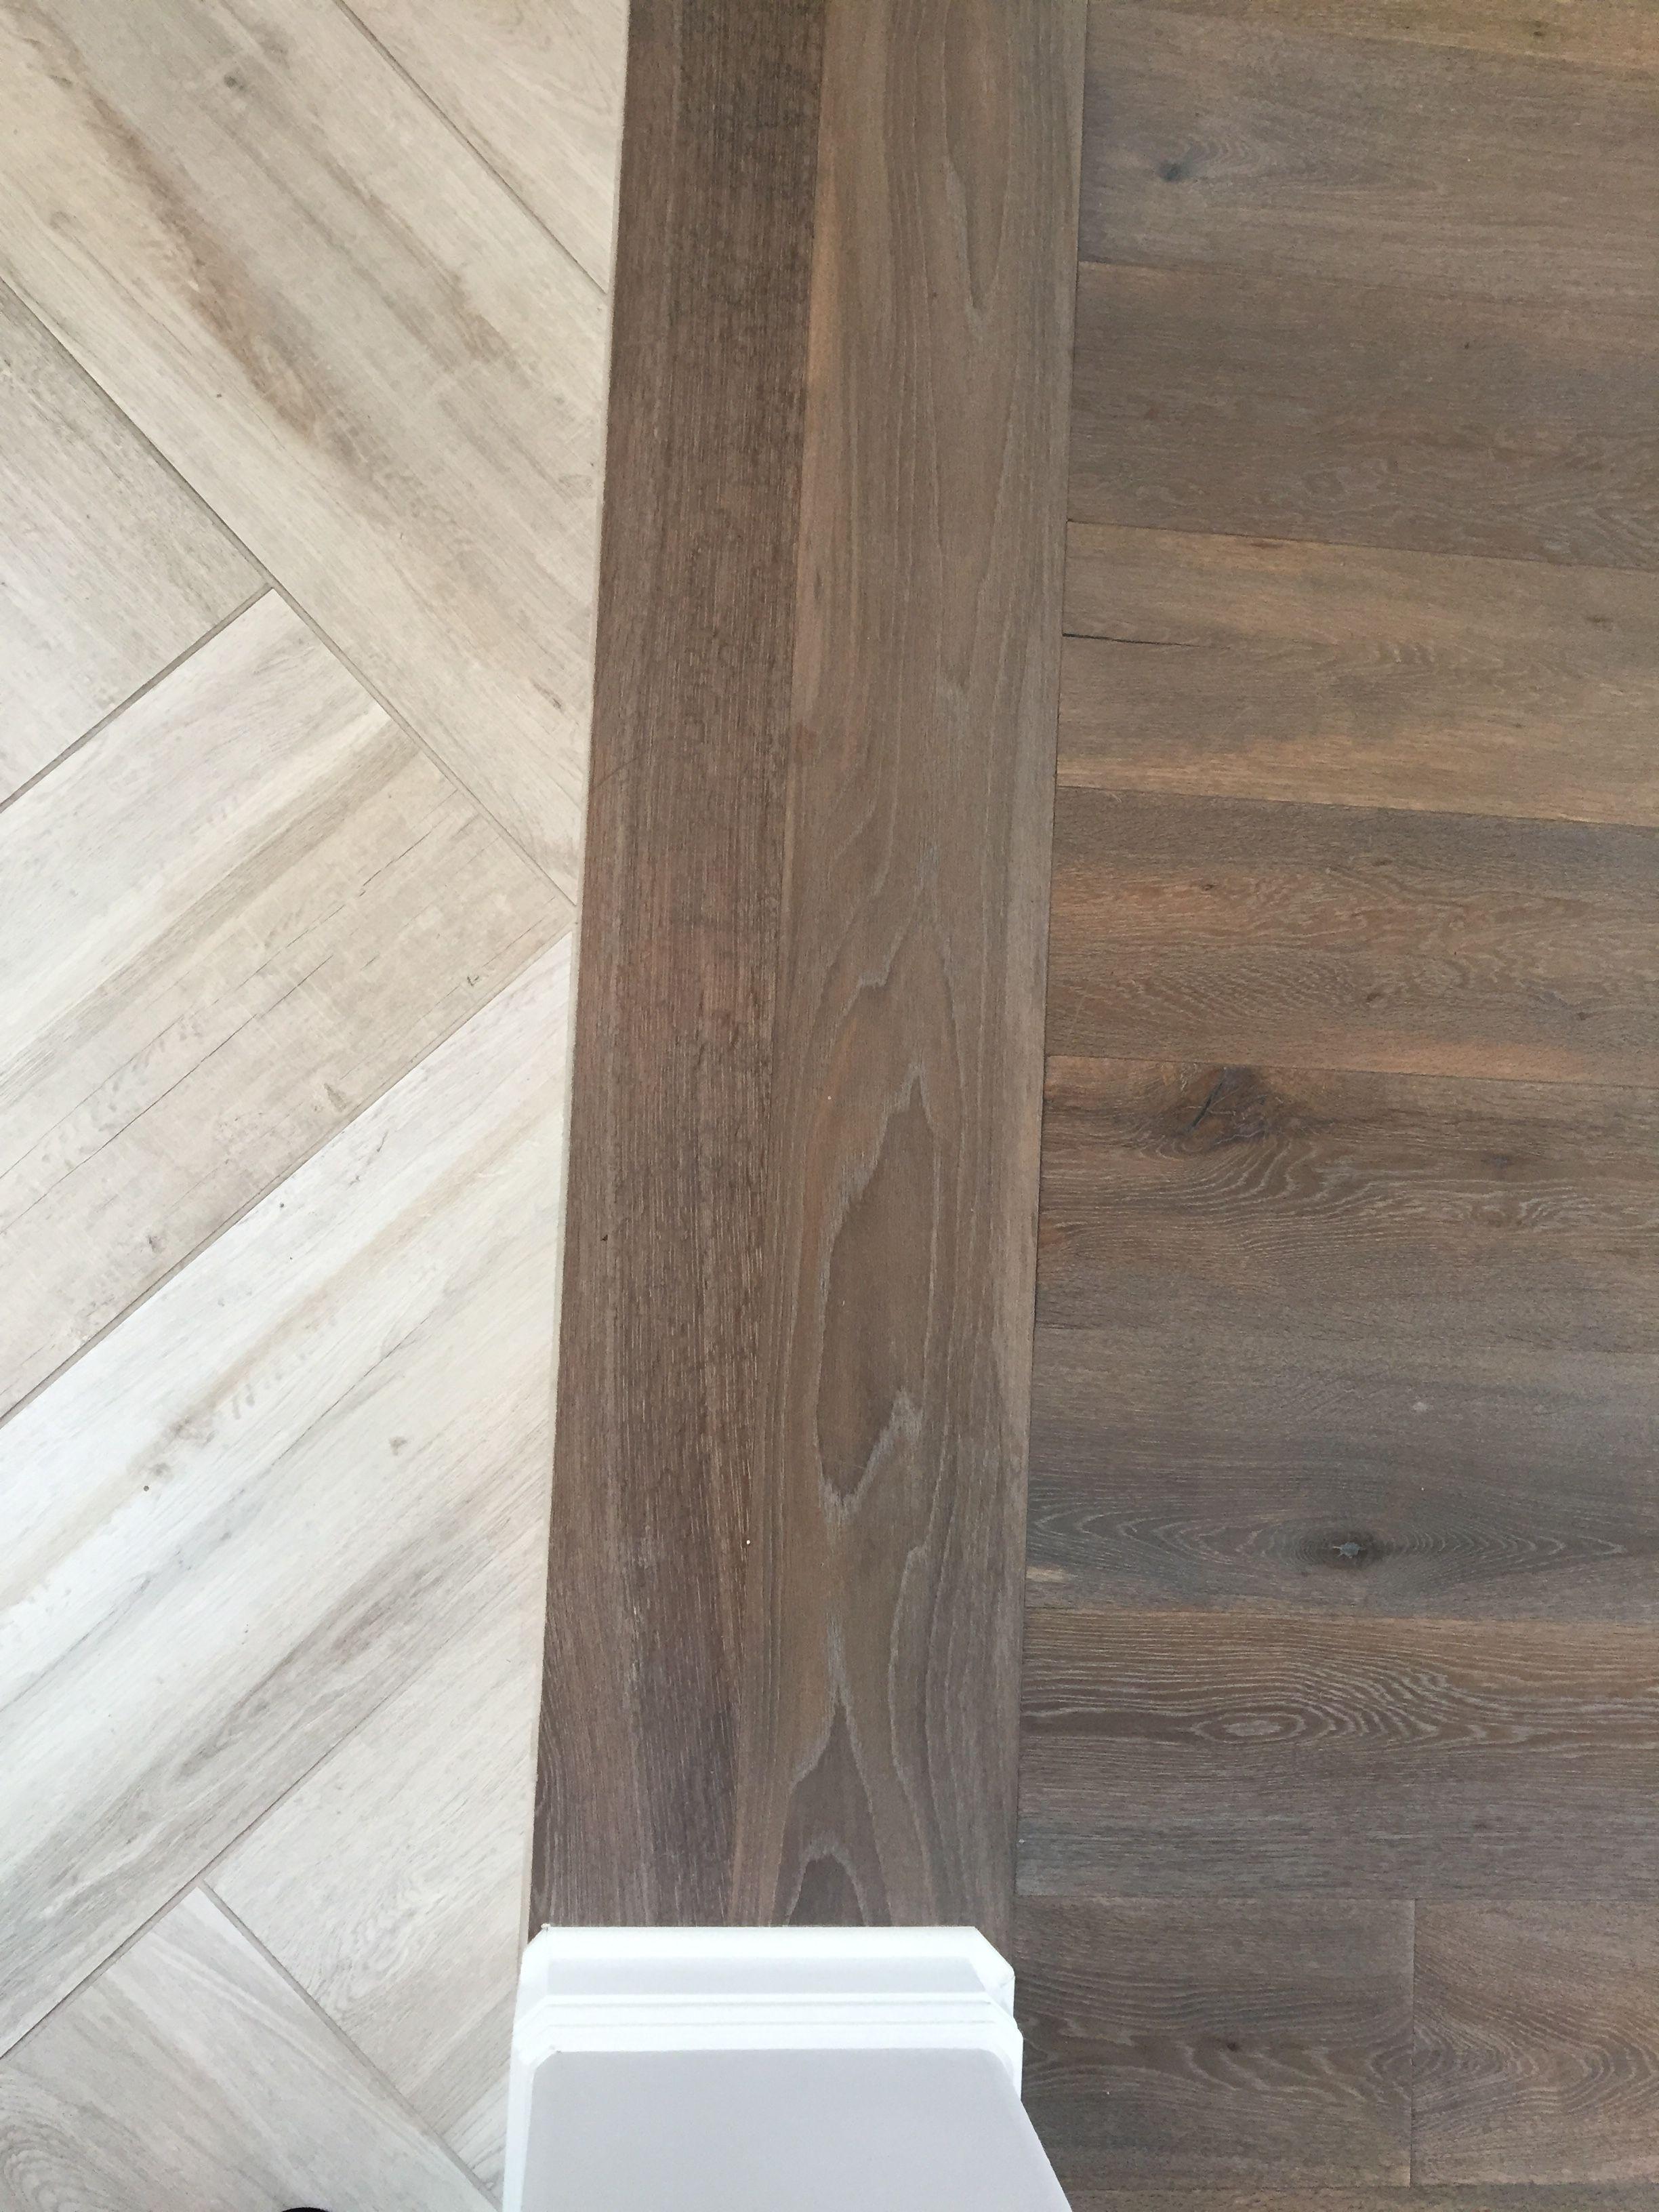 average cost to install laminate hardwood floors of floor transition laminate to herringbone tile pattern model throughout floor transition laminate to herringbone tile pattern herringbone tile pattern herringbone wood floor